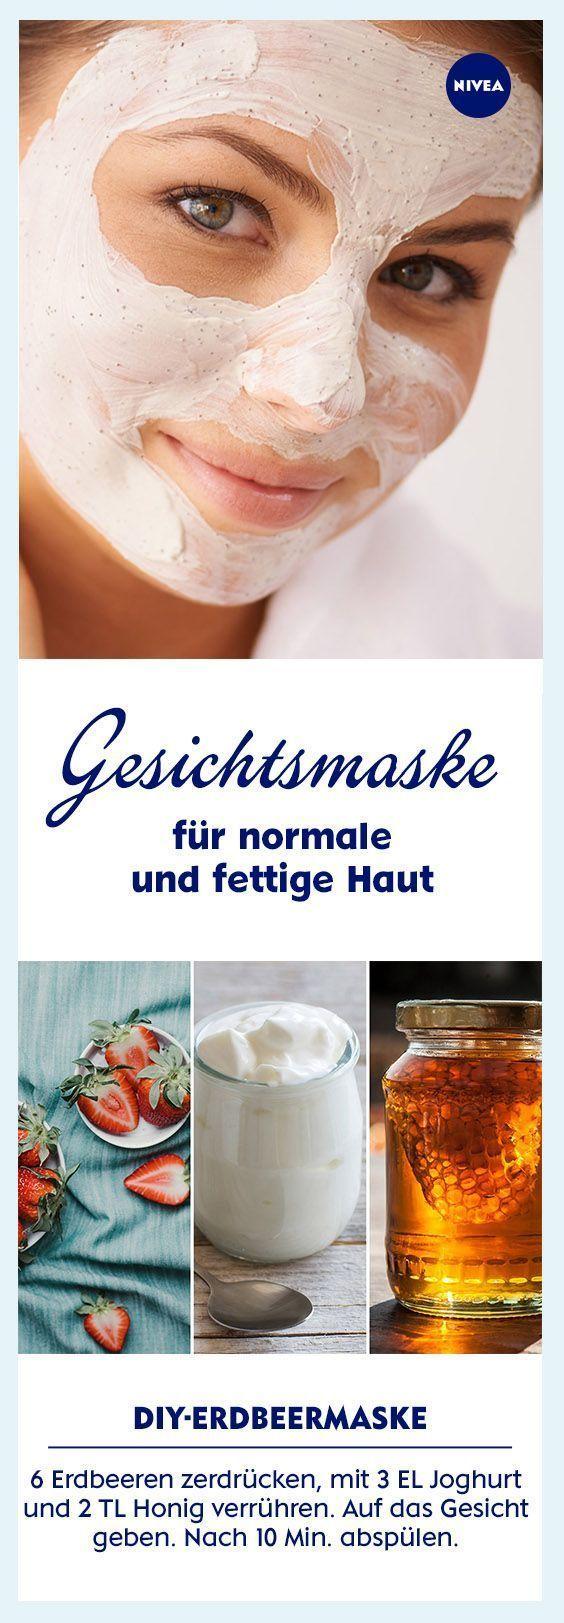 Make face mask yourself: mix strawberries, yogurt and honey, apply and apply.  -  Hautpflege-Rezepte